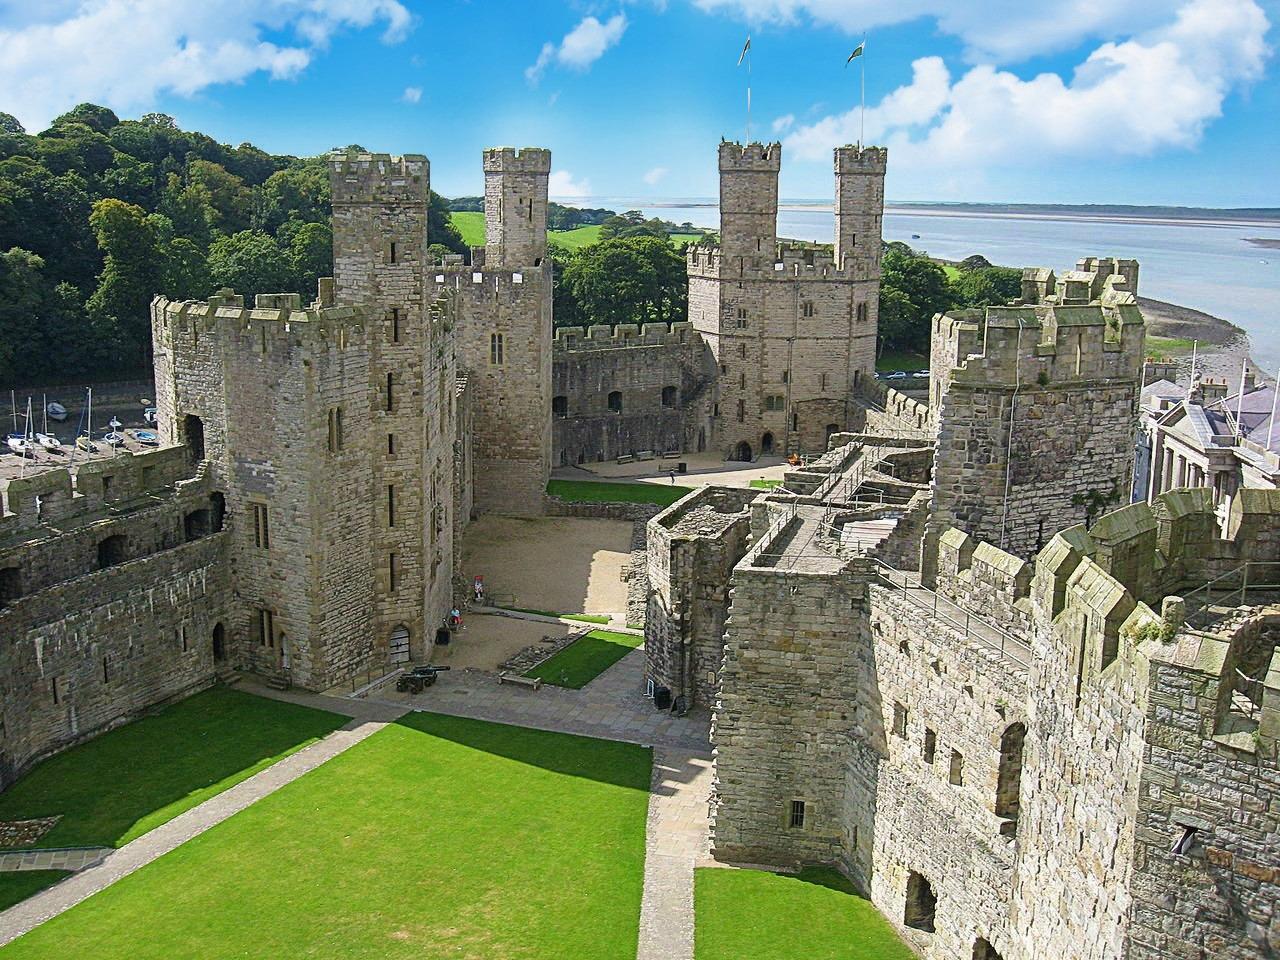 Caernarfon Castle. Credit Albertistvan